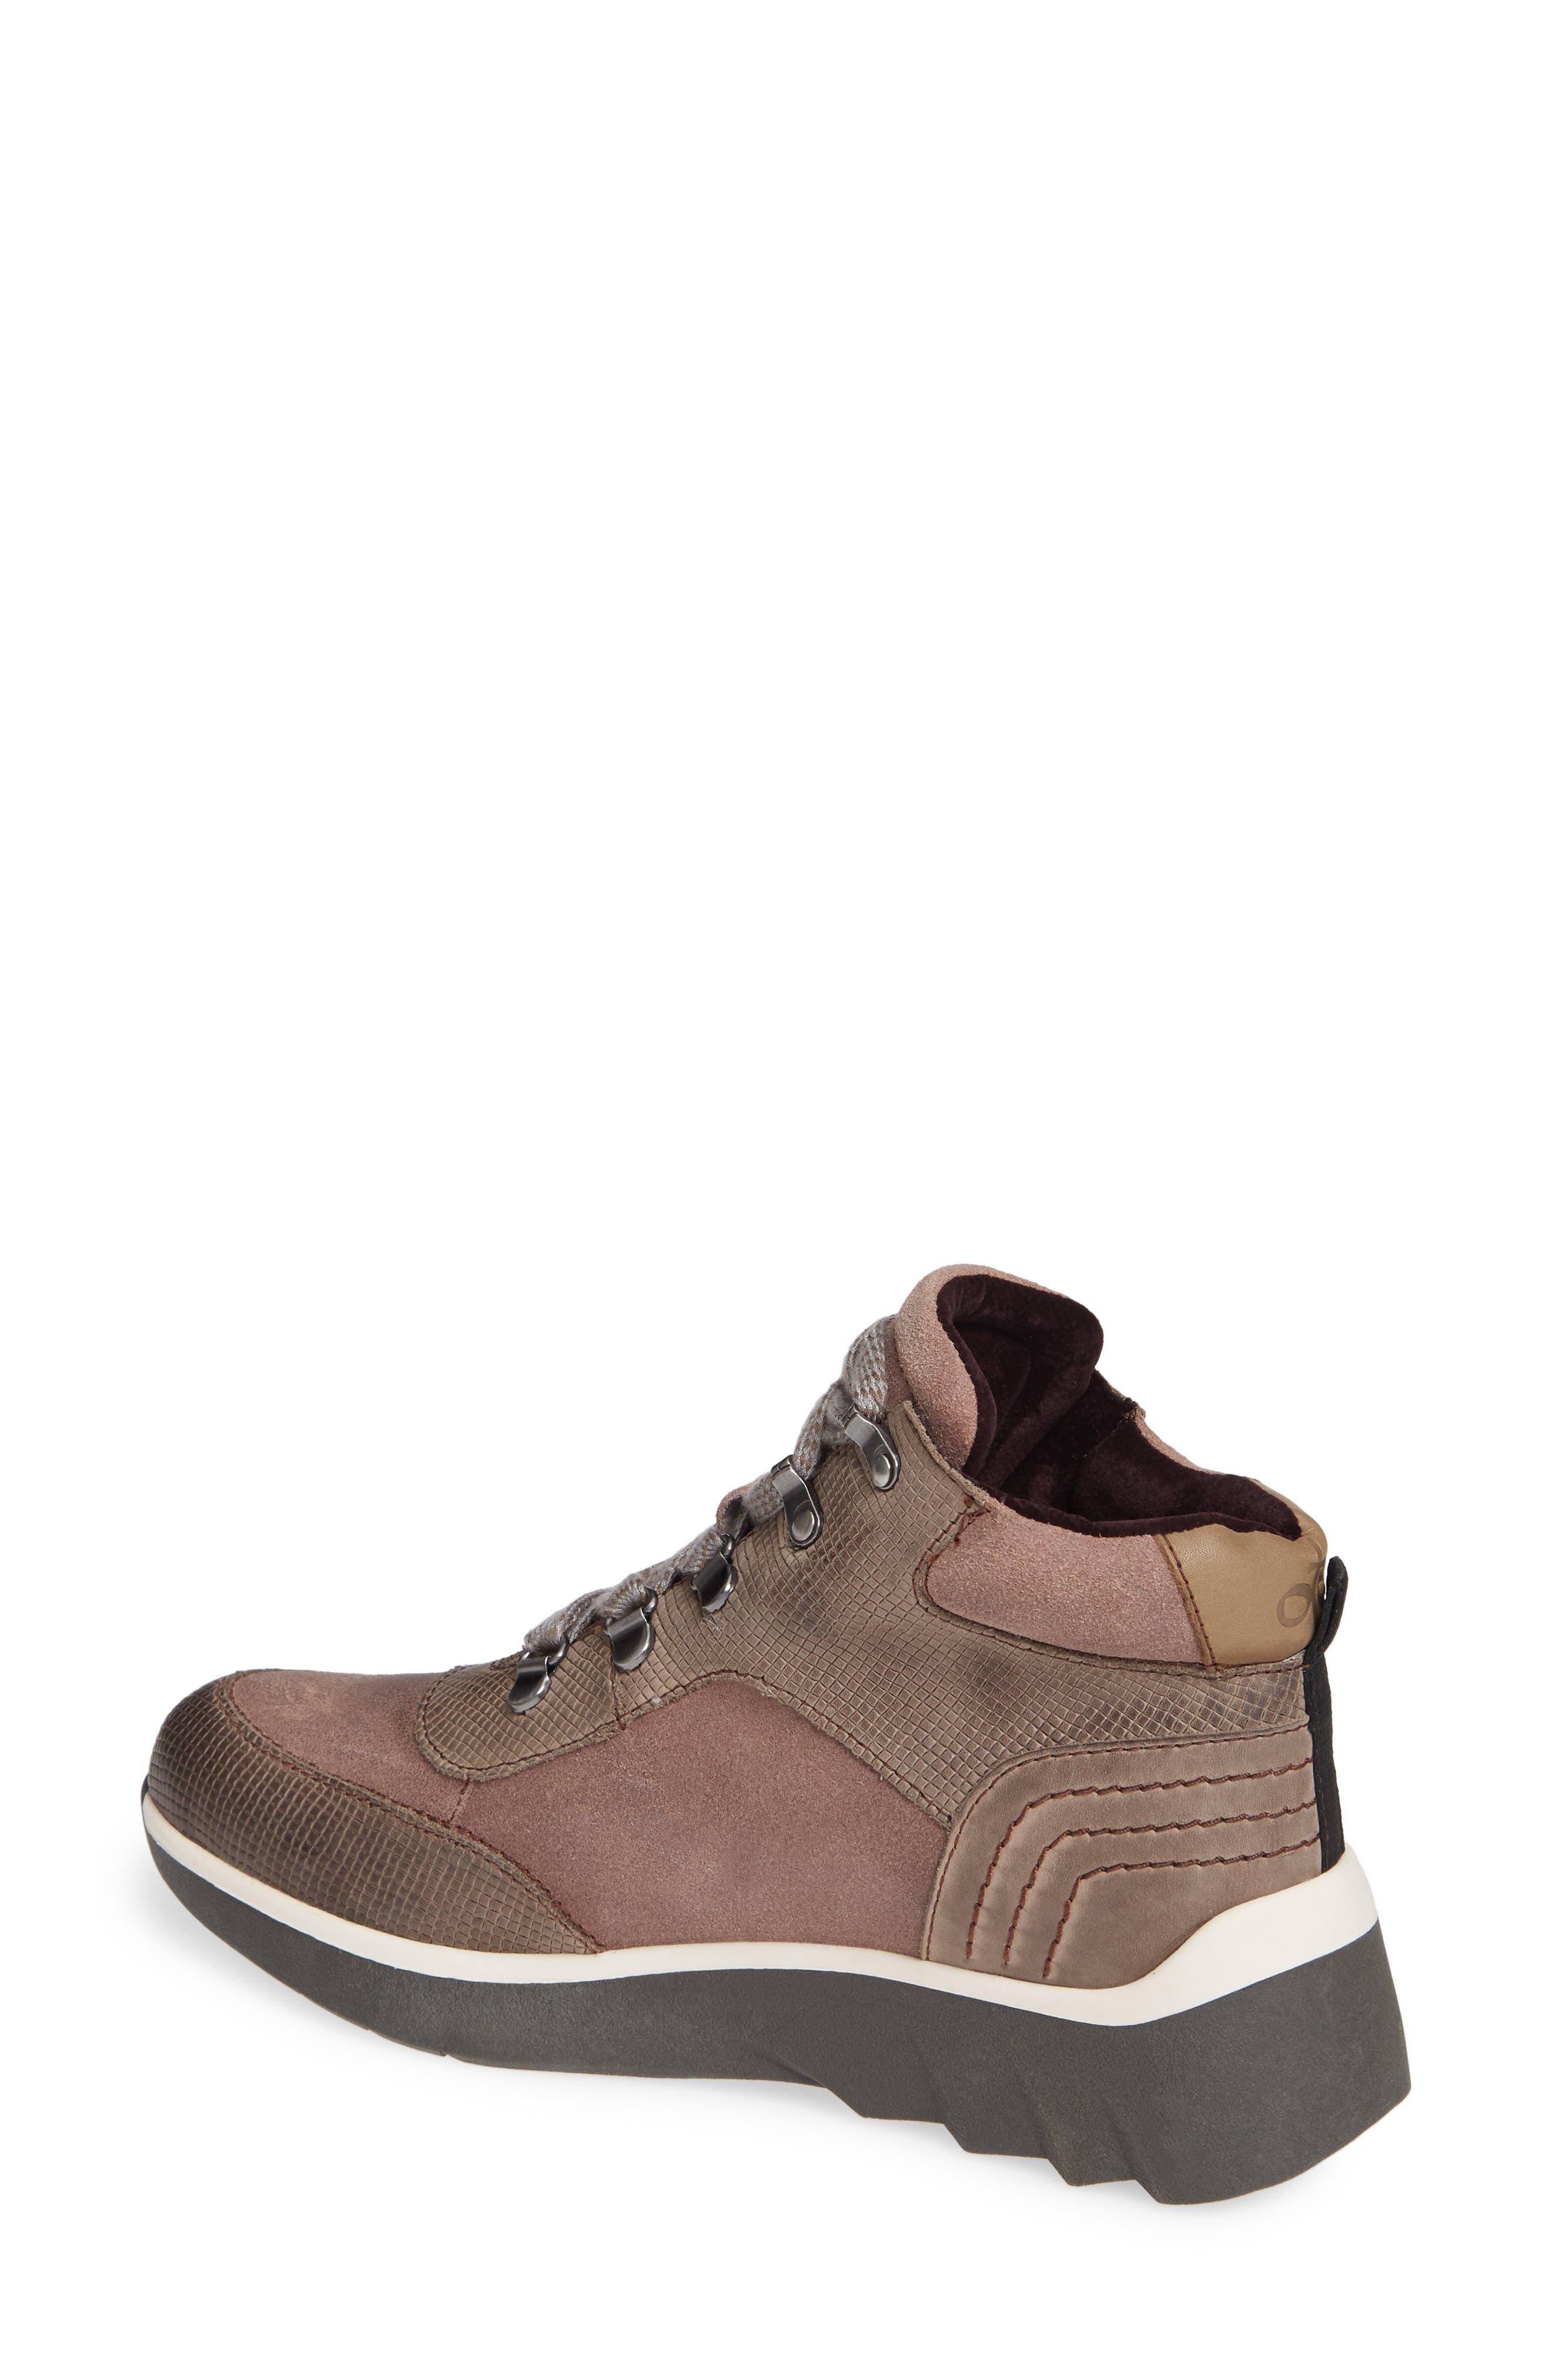 Commuter Sneaker,                             Alternate thumbnail 2, color,                             CINDER LEATHER